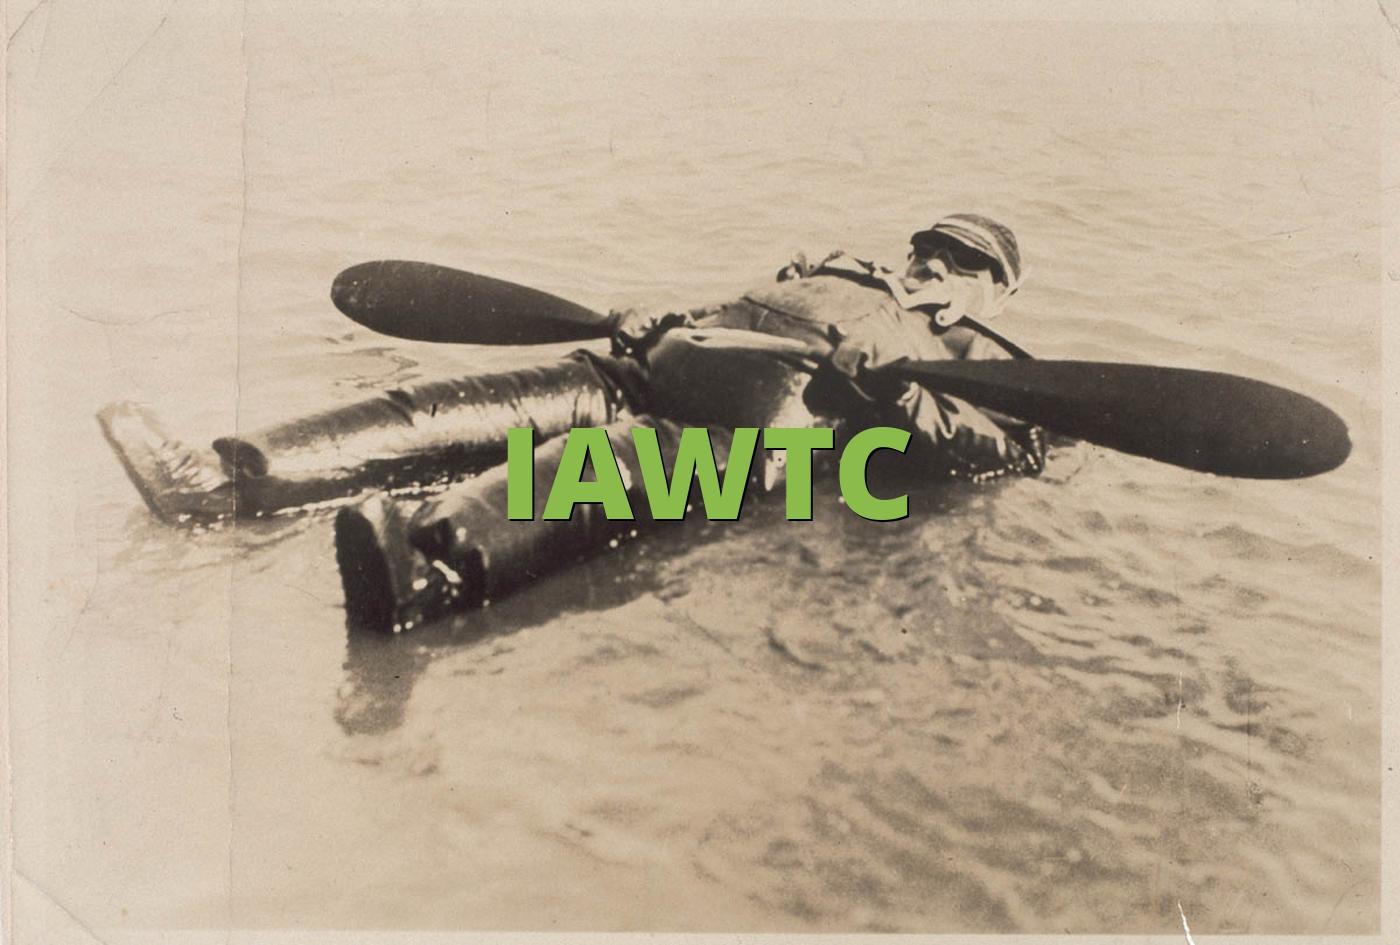 IAWTC